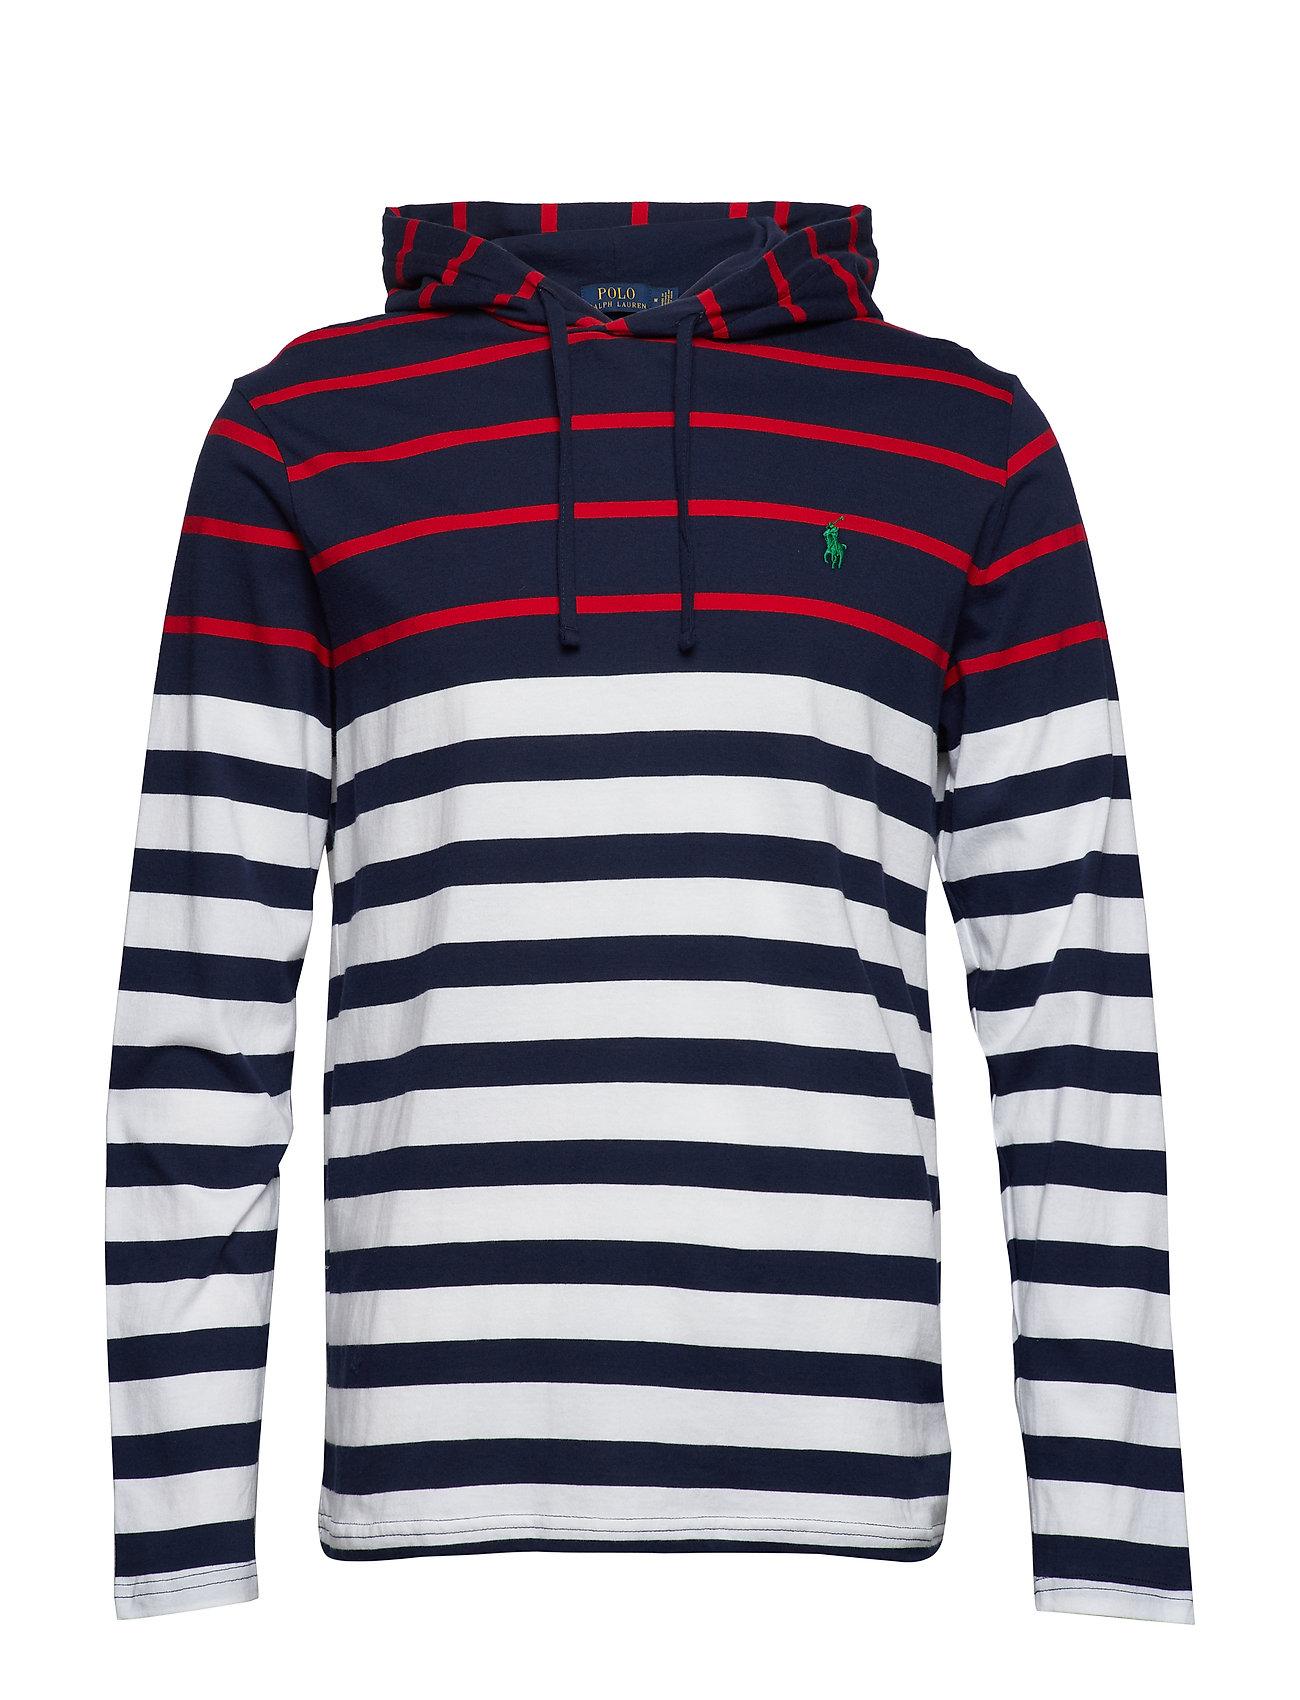 Polo Ralph Lauren Striped Cotton Hooded Tee